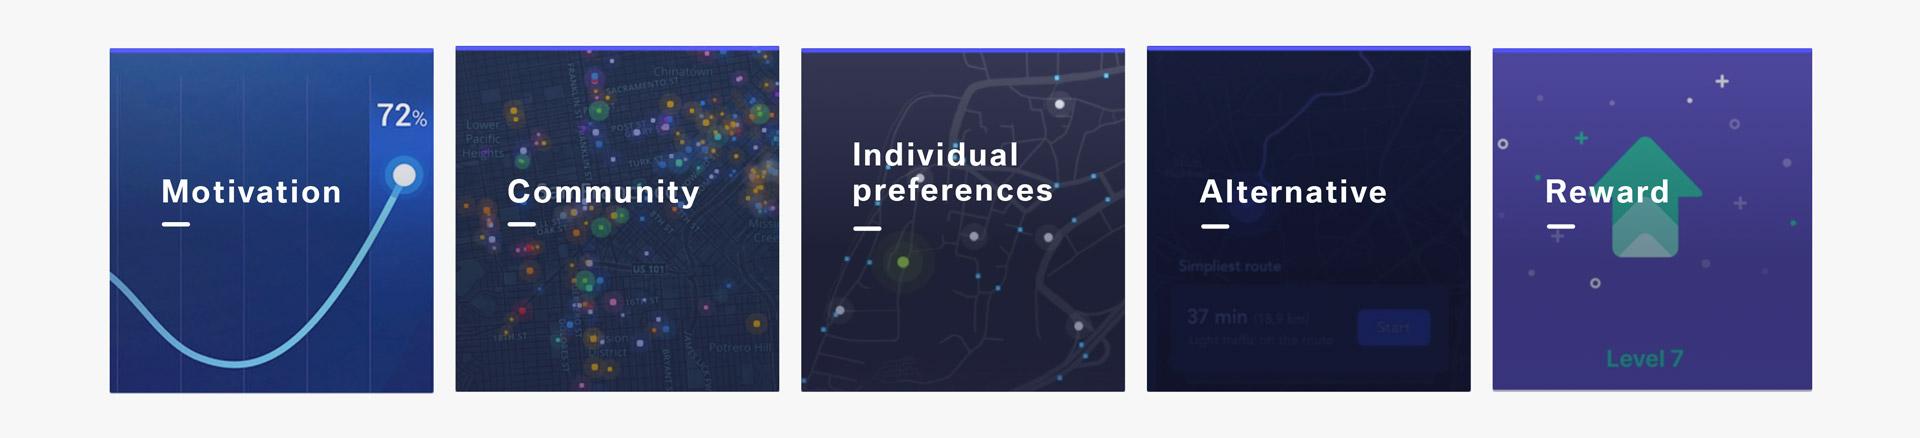 principles_competence